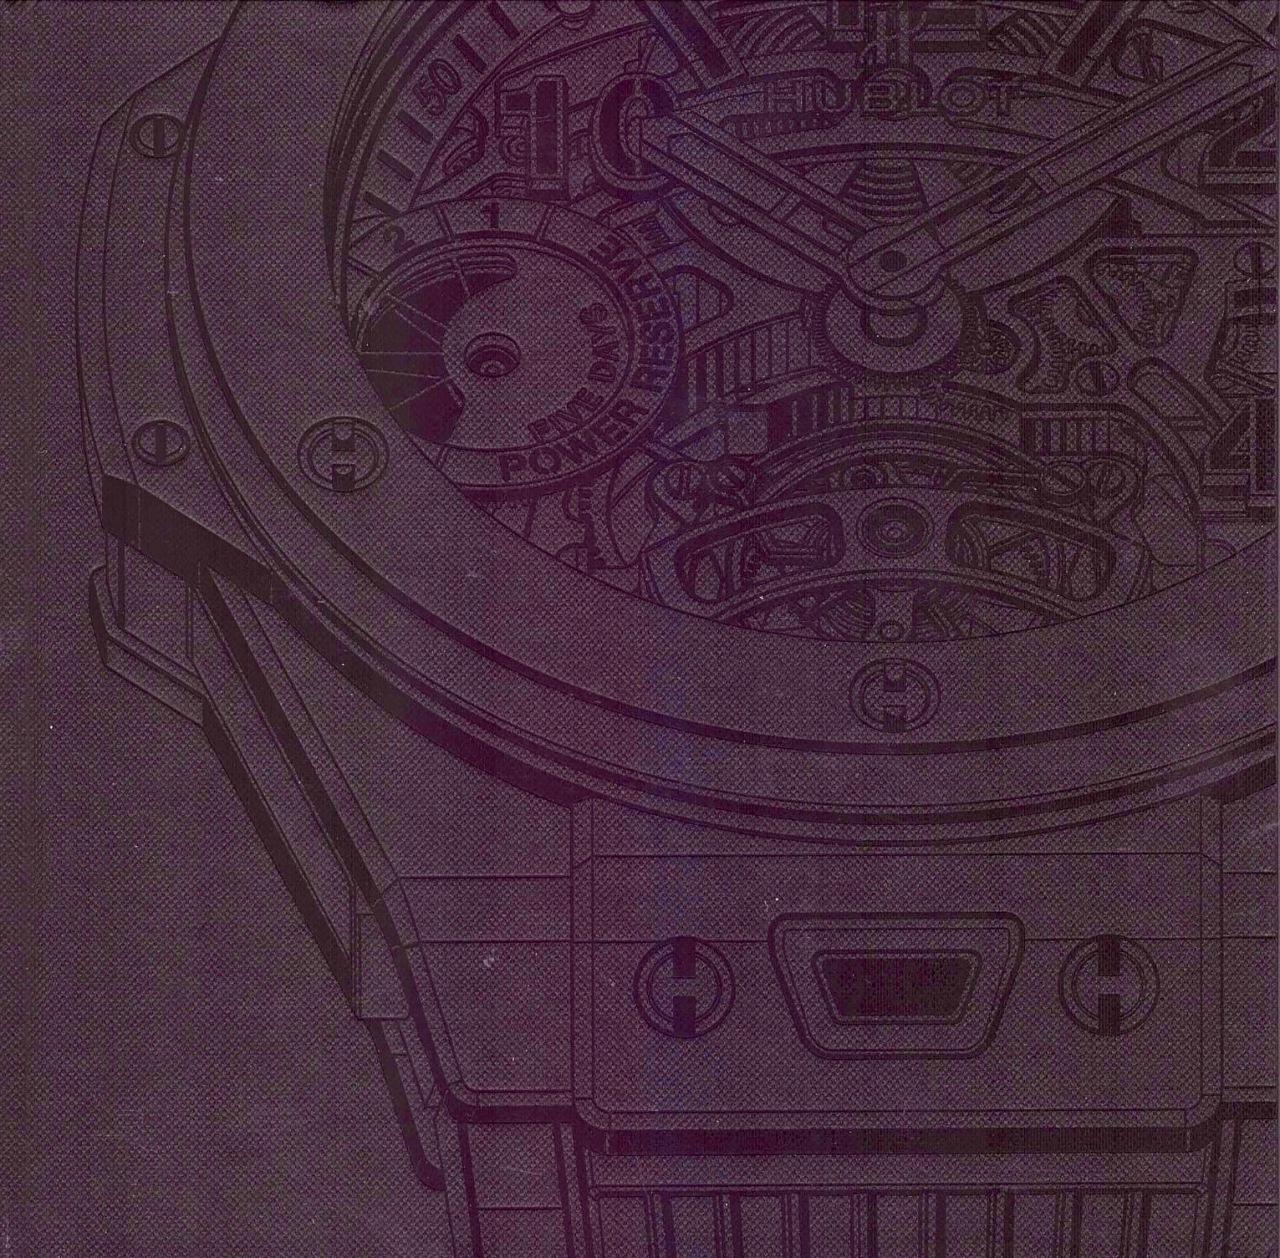 Der Hublot Katalog2015